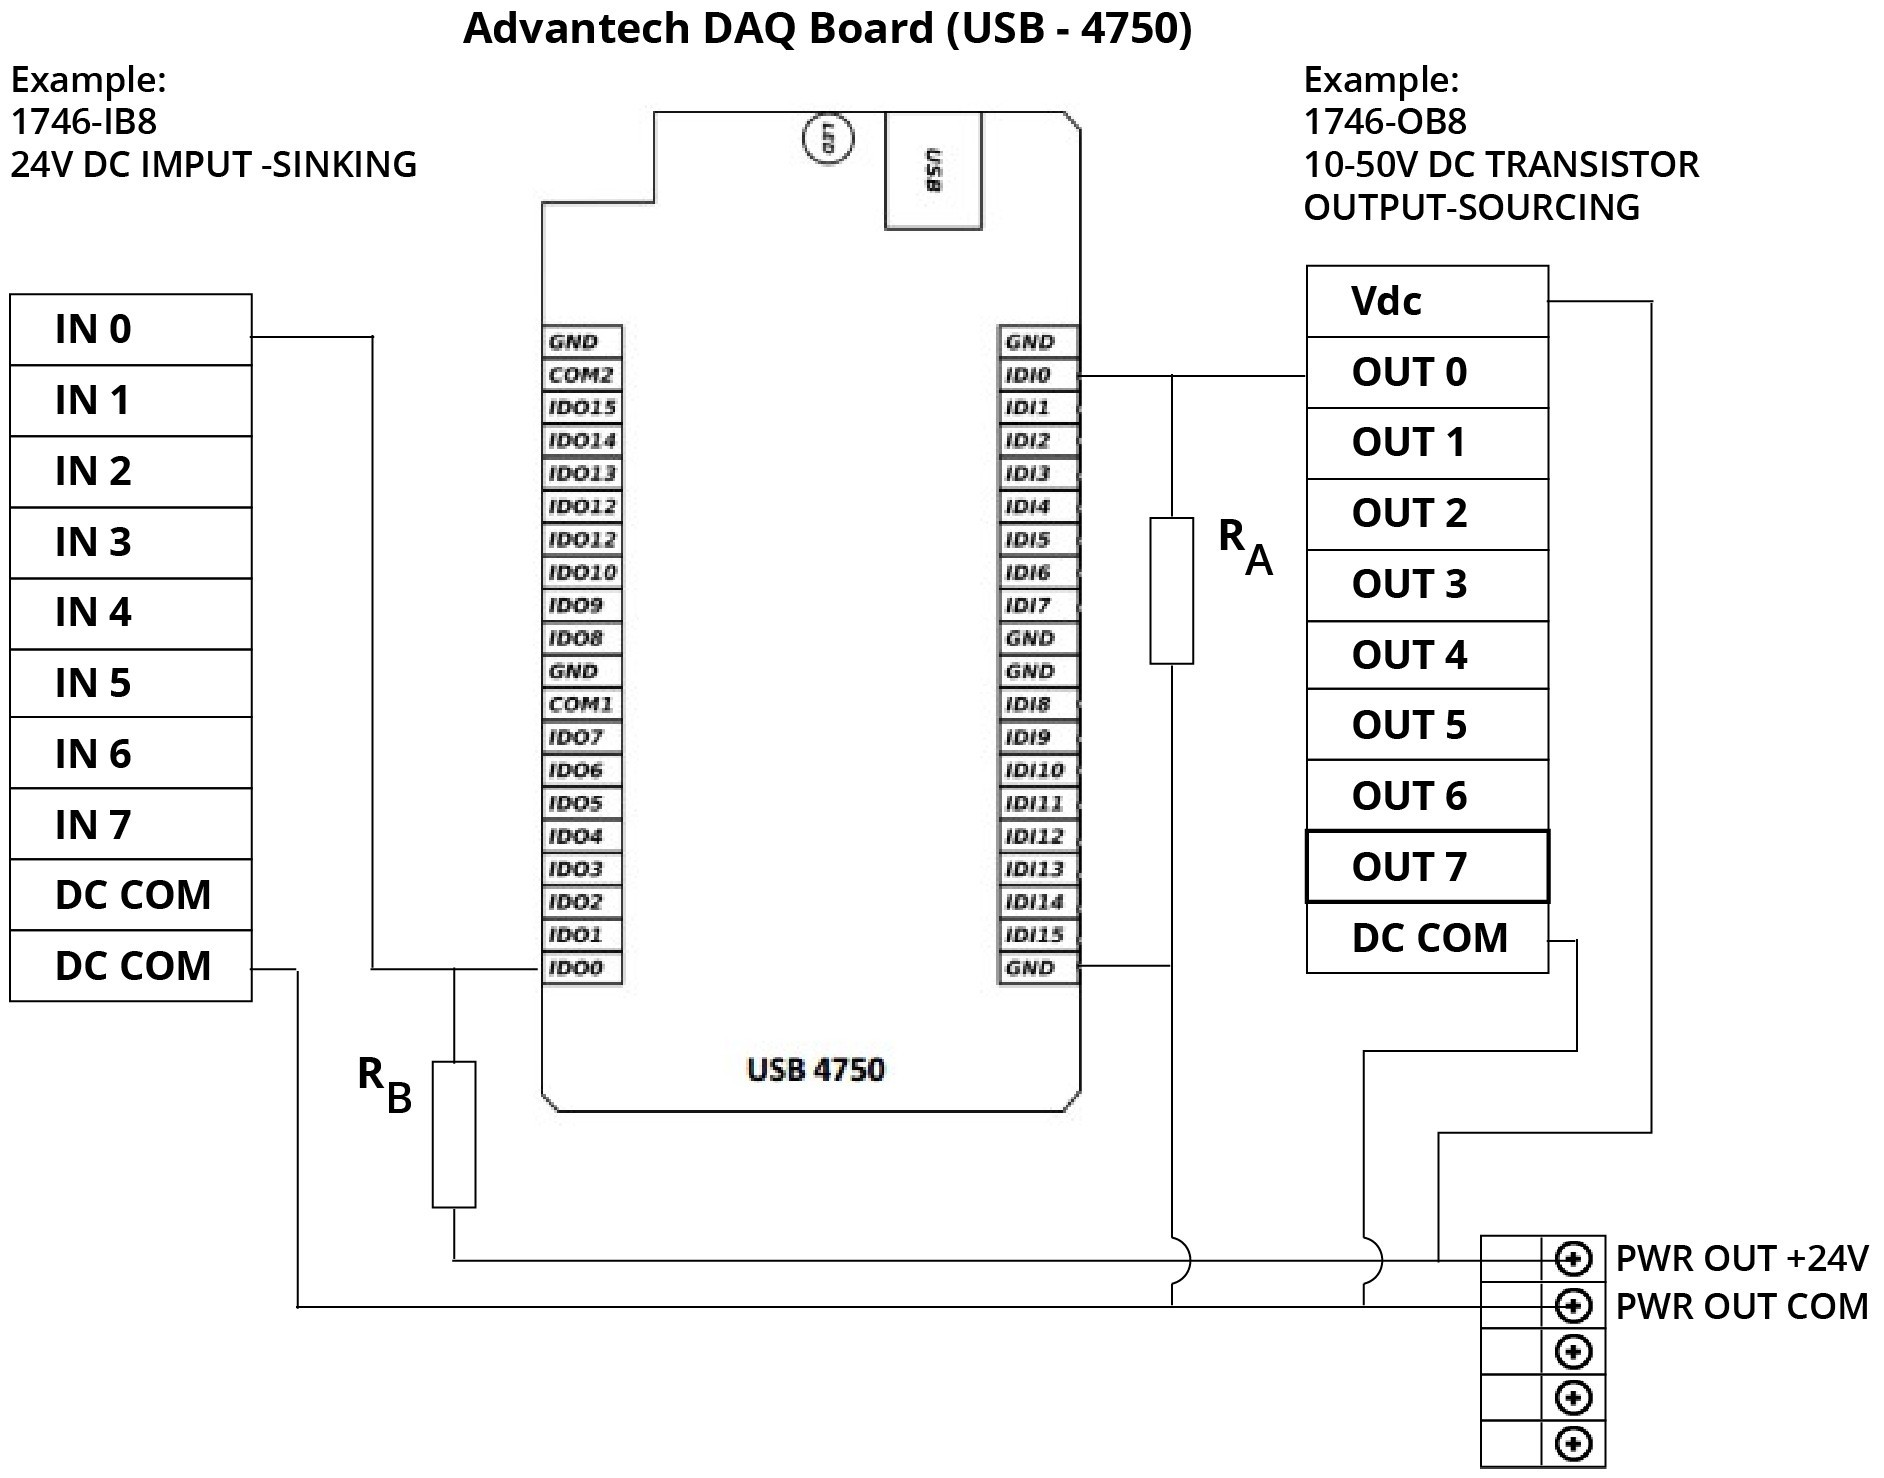 Plcm7500 wiring diagram wiring diagram image wiring diagram with plc valid wiring diagrams factory i o asfbconference2016 Choice Image